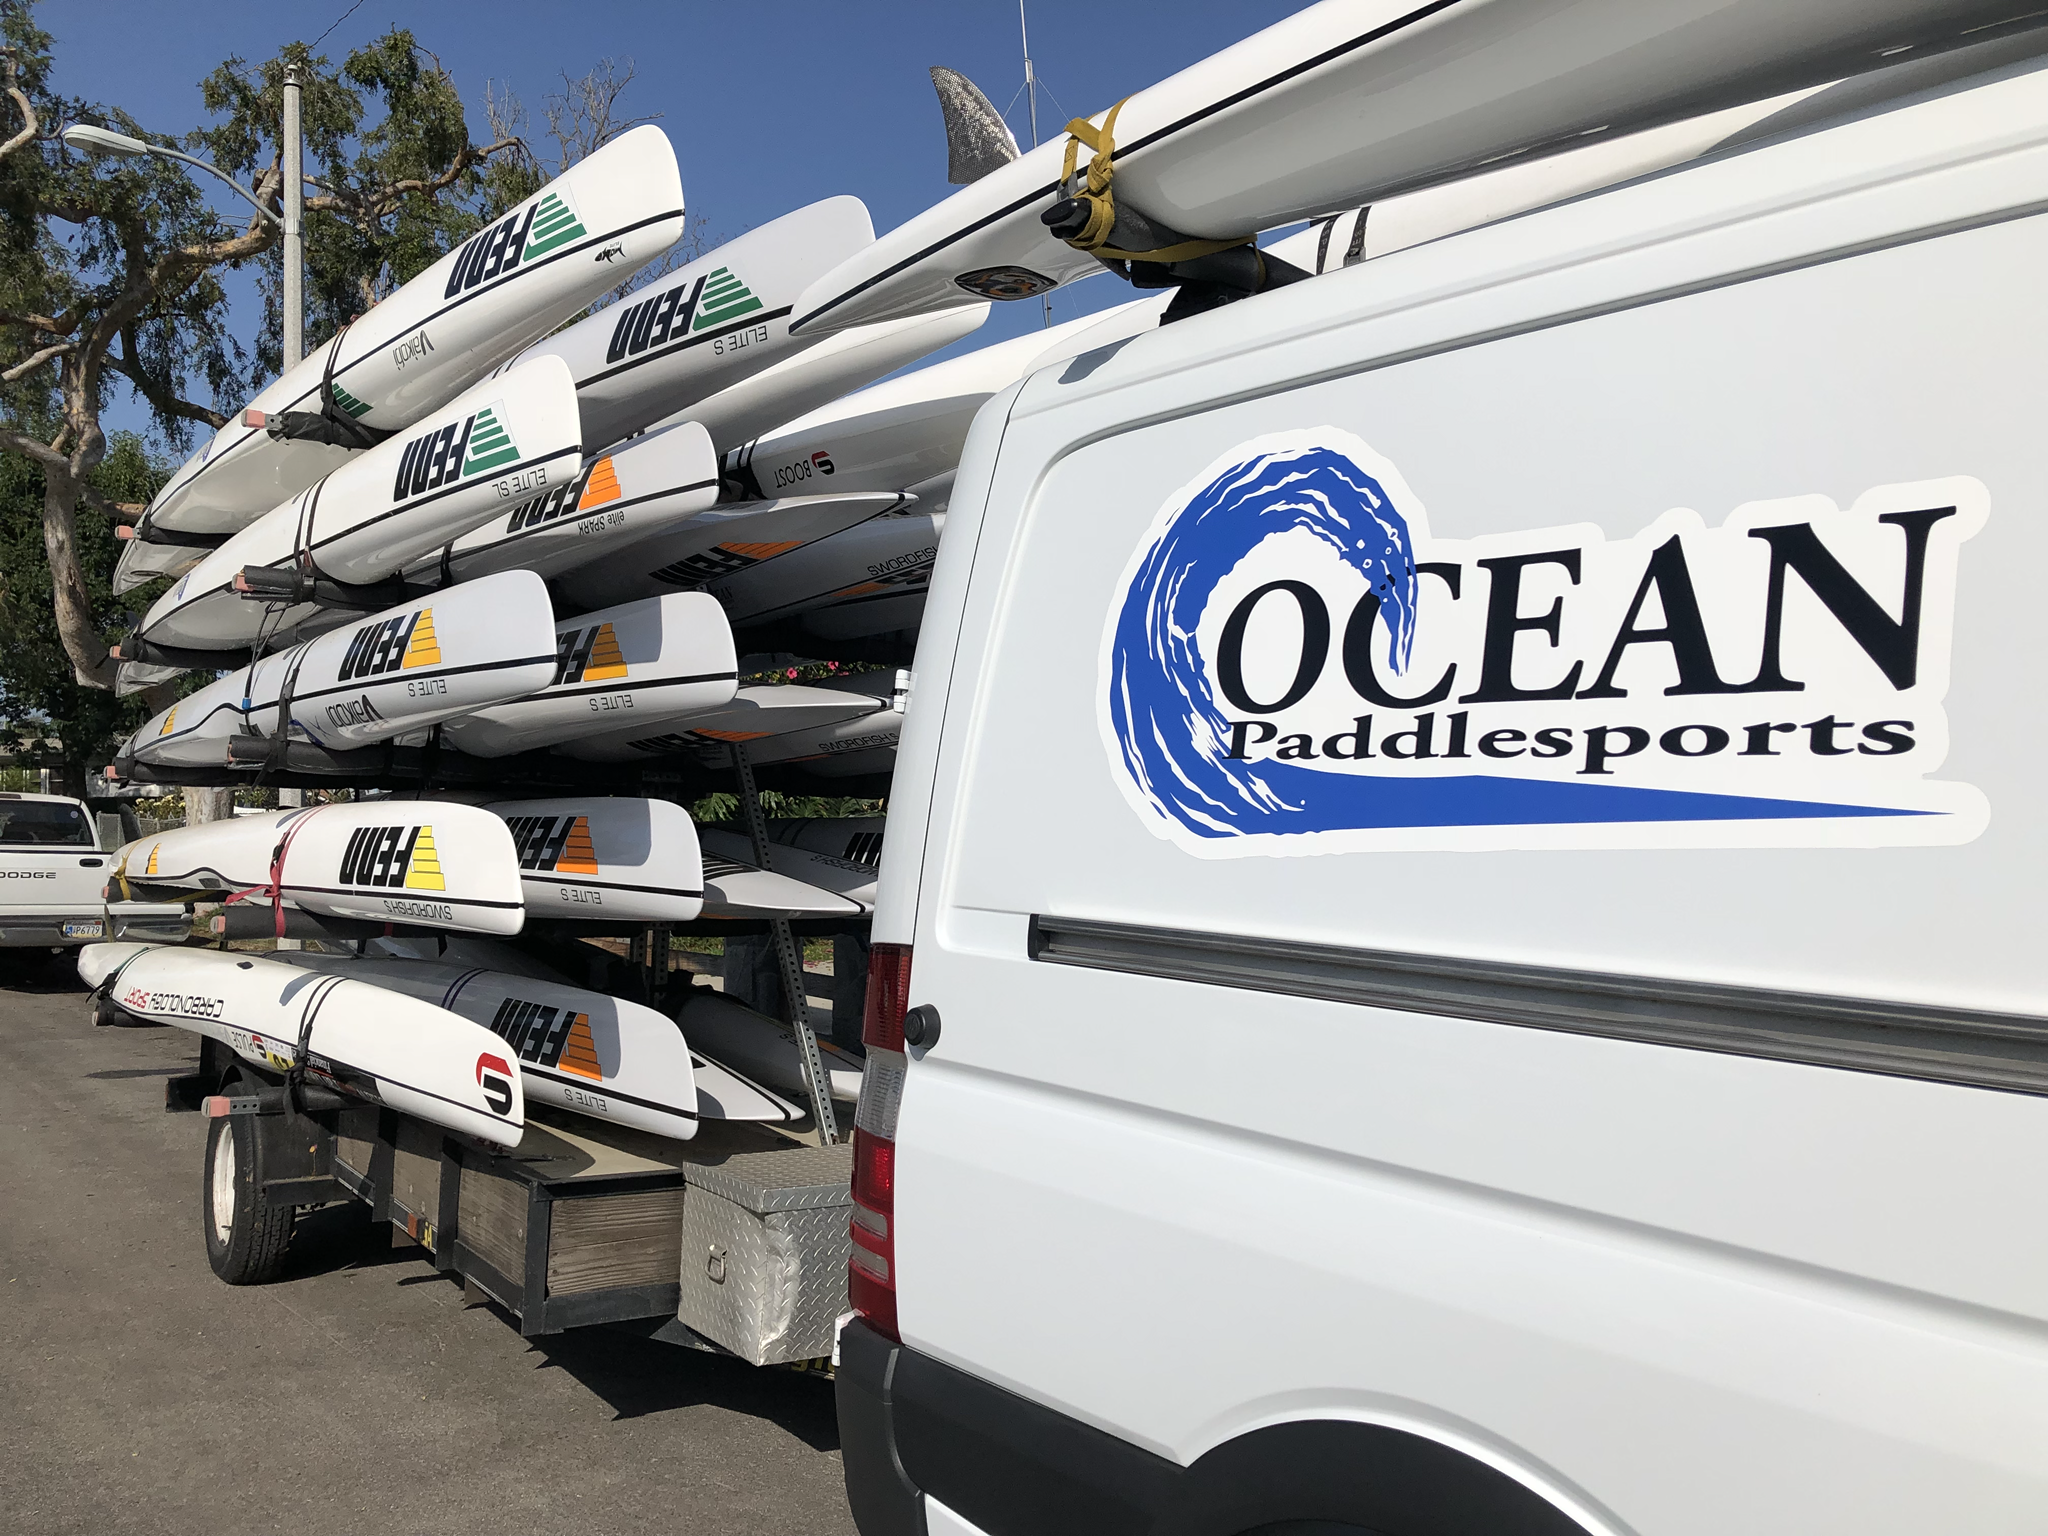 Ocean Paddlesports sticker